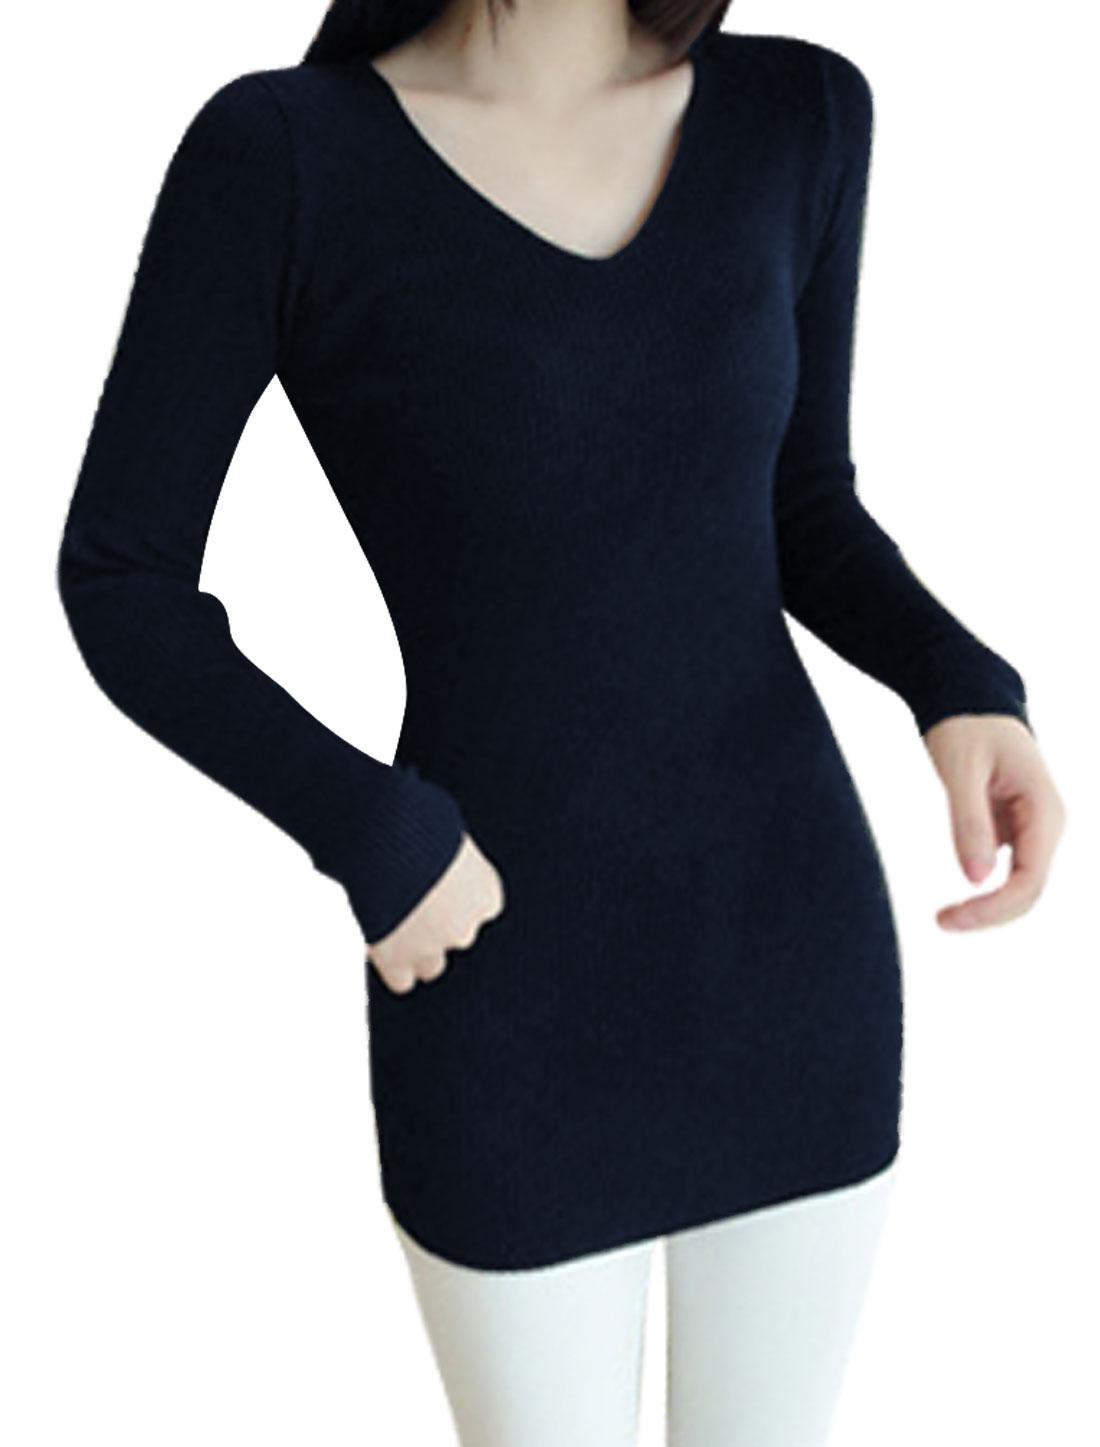 Lady V Neck Long Sleeve Ribbed Slim Tunic Knit Shirt Navy Blue XS